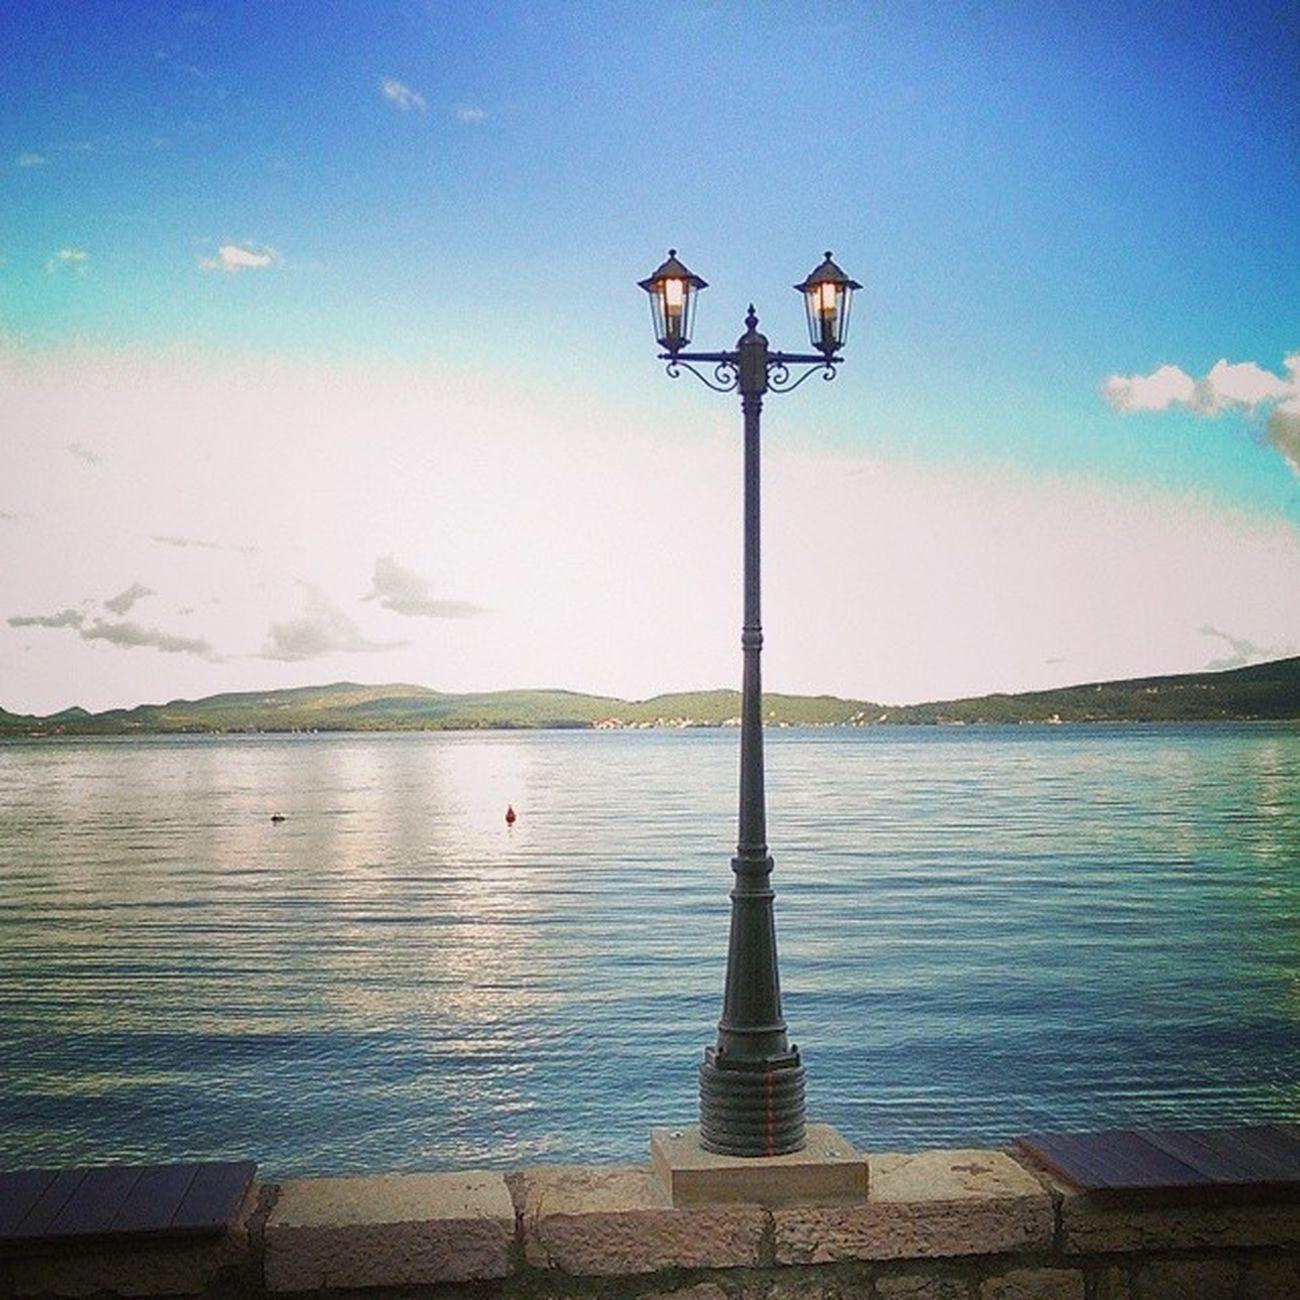 Streetlight Bayofkotor Baylife Bliss Sea Montenegro Landscape